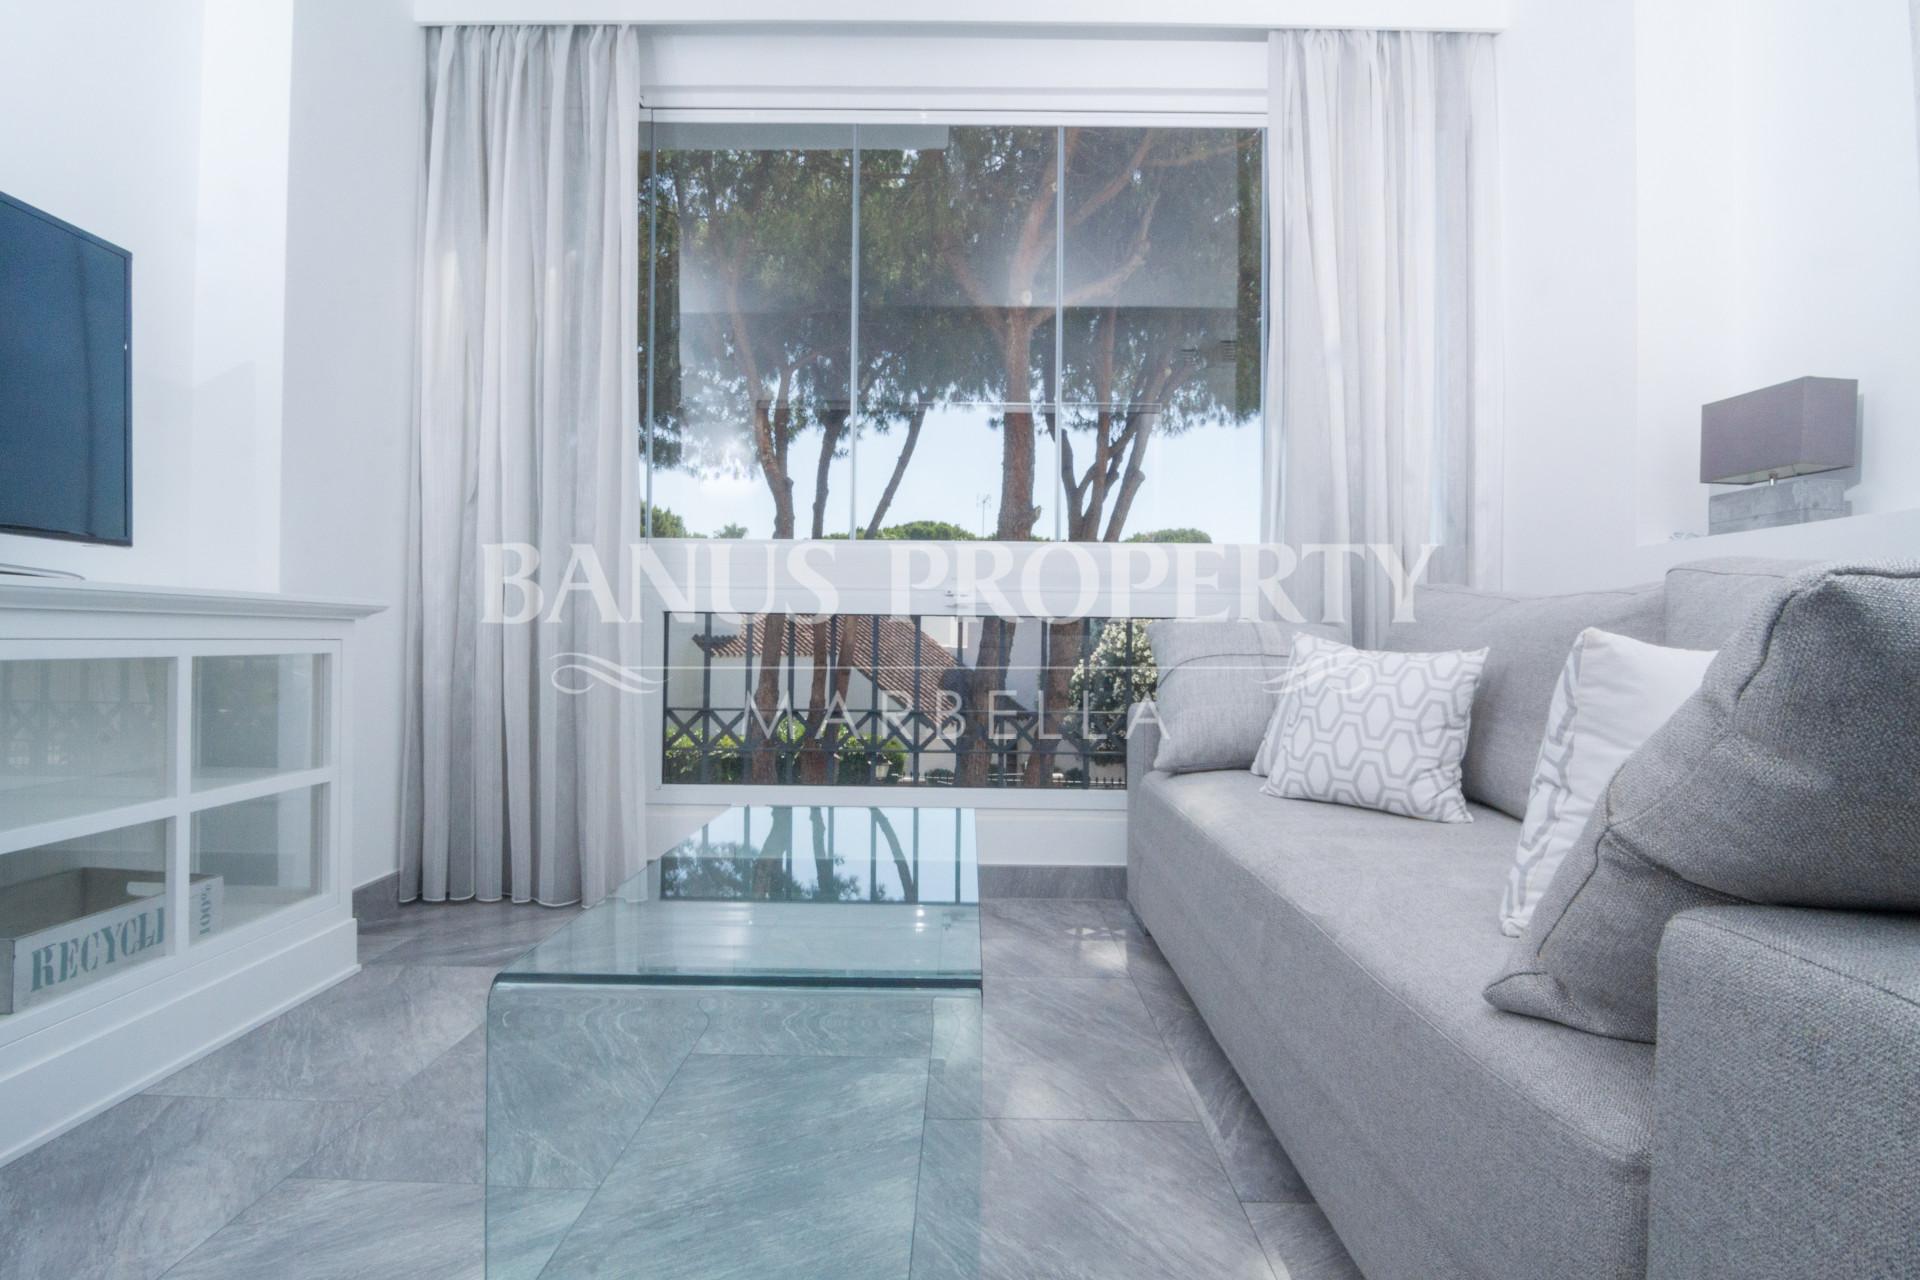 Renovated modern first floor studio apartment for sale in Medina Garden, Puerto Banús